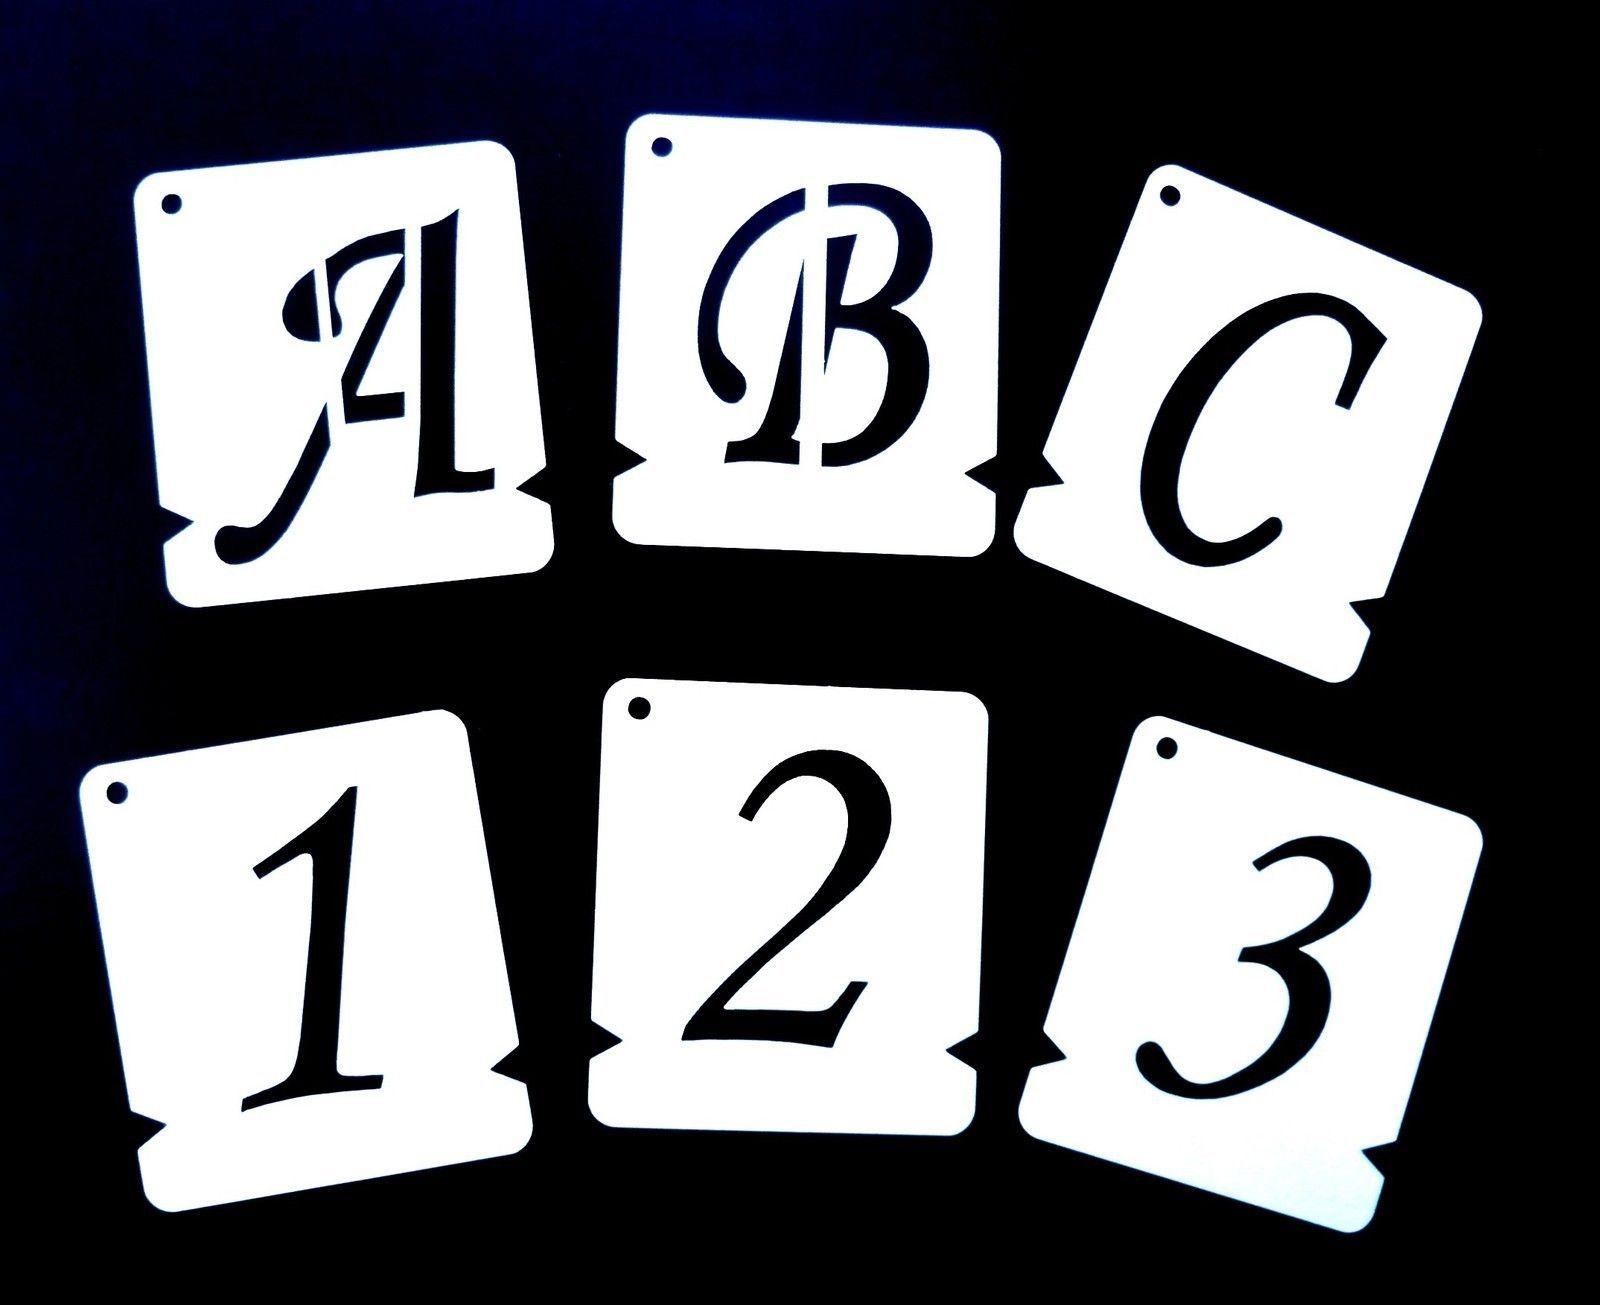 alphabet stencils individual letter stencils a z 0 9 monotype corsiva free